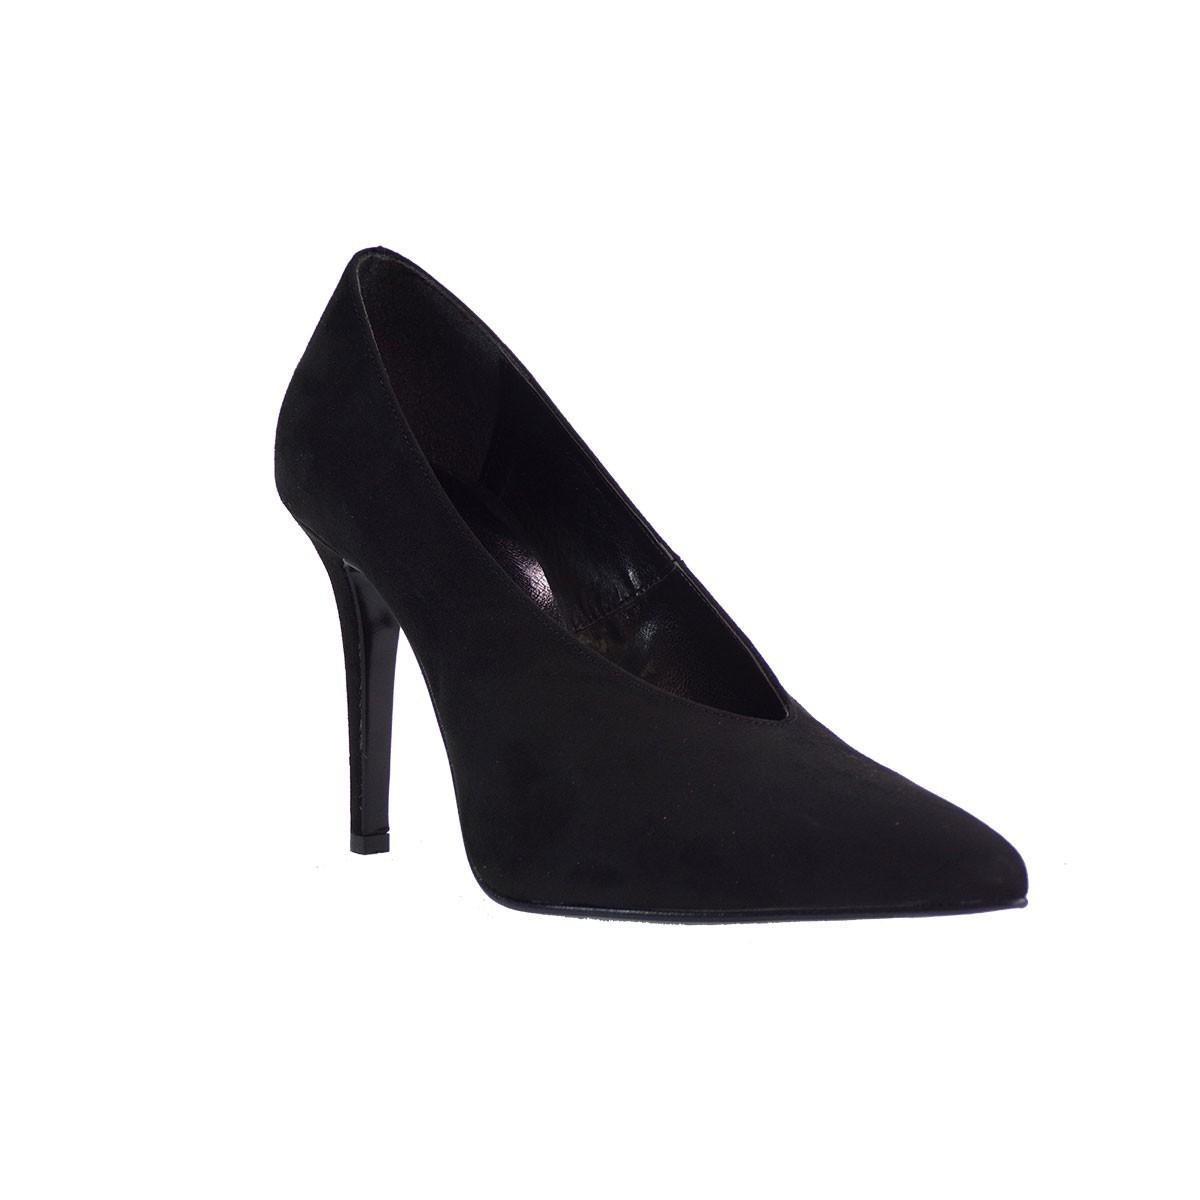 KATIA SHOES Γυναικεία Παπούτσια Γόβες 145/4807 Μαύρο Καστόρι